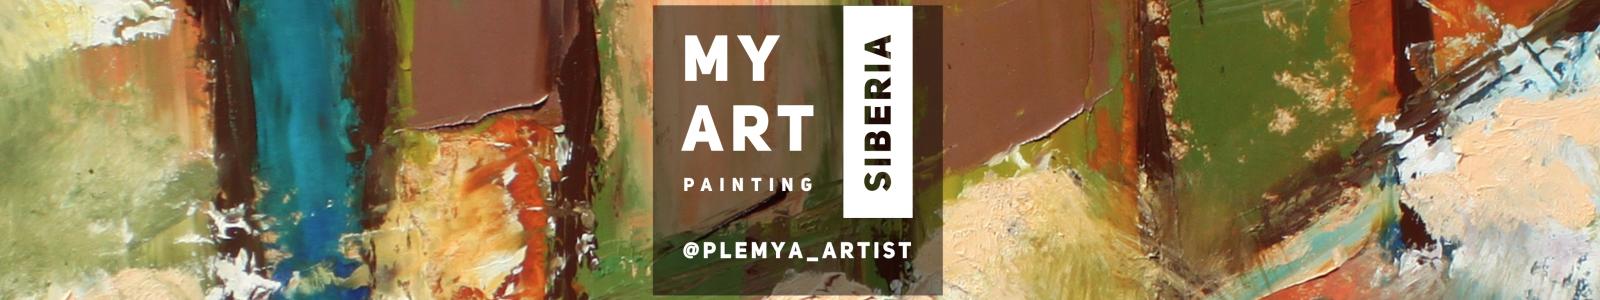 Gallery Painter Igor Ustinin